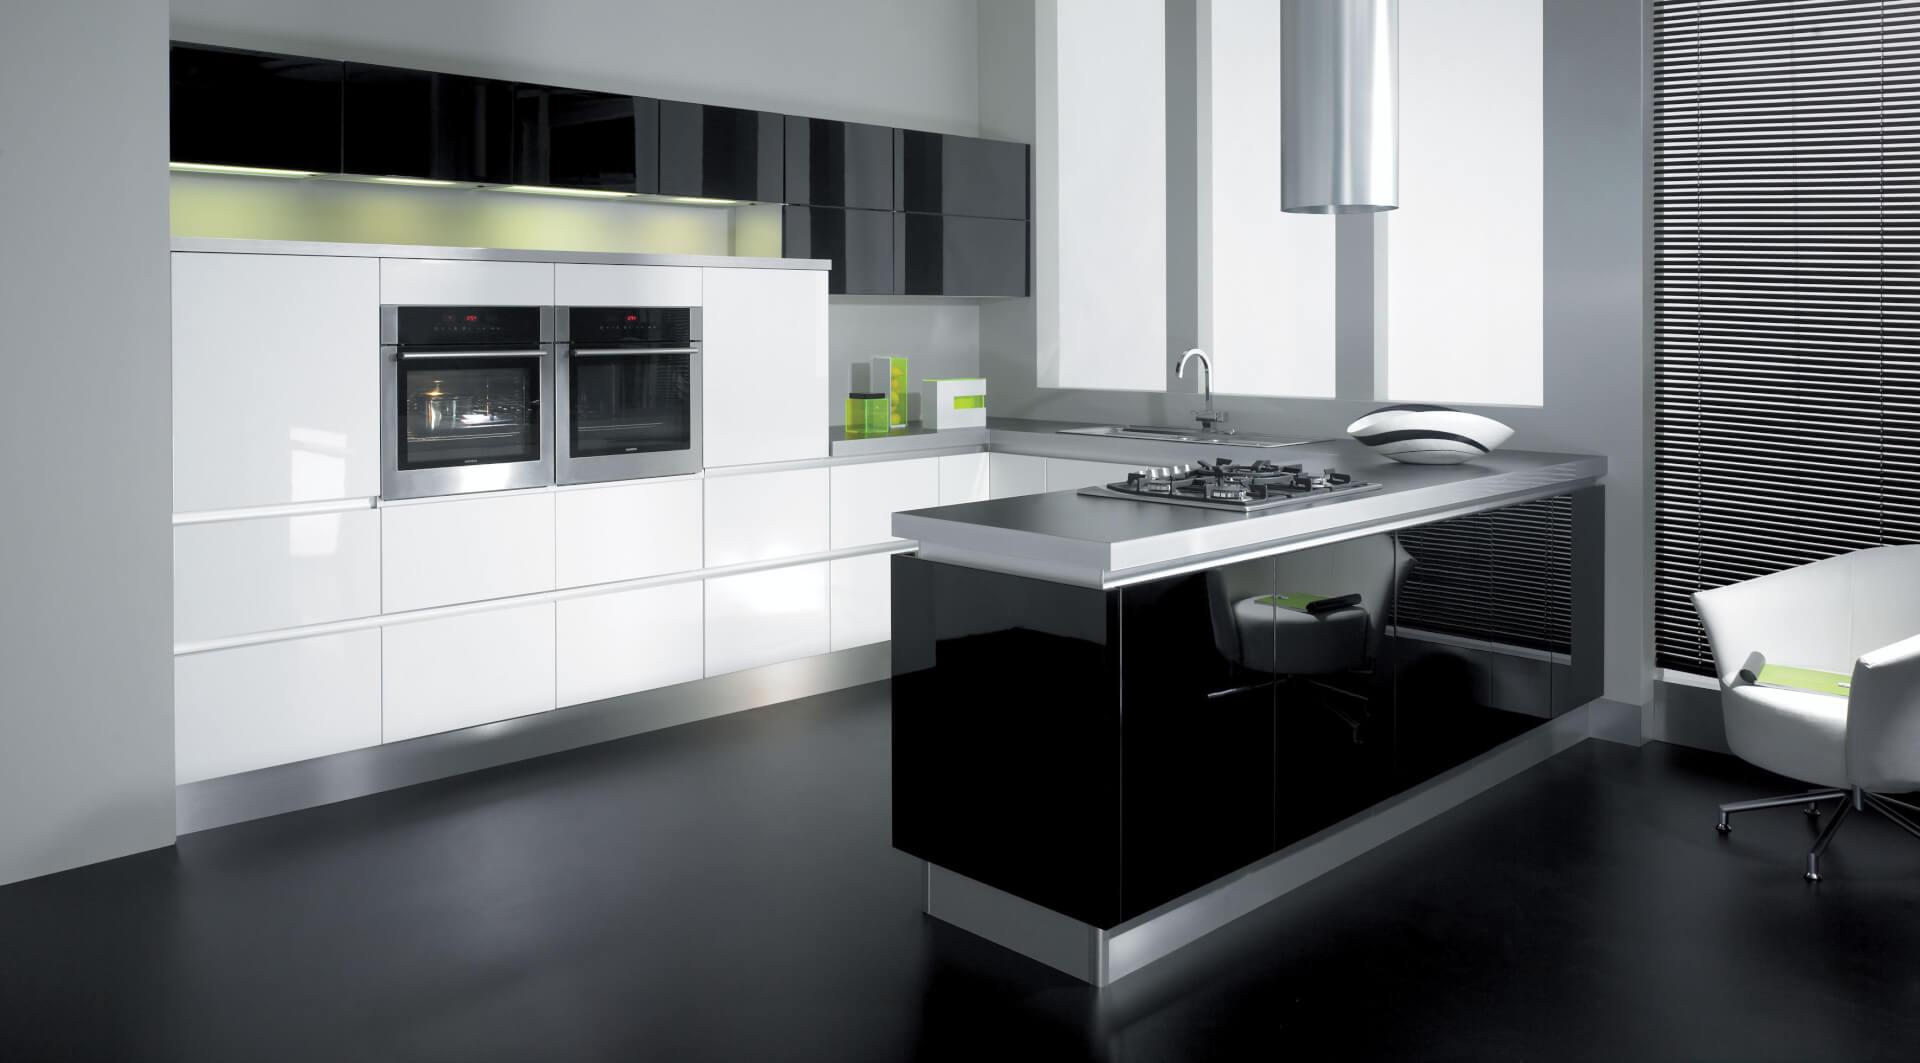 Modern Kitchen As Interesting Kitchen Cabinets Design With Inspiration  Stunning Design Ideas 51